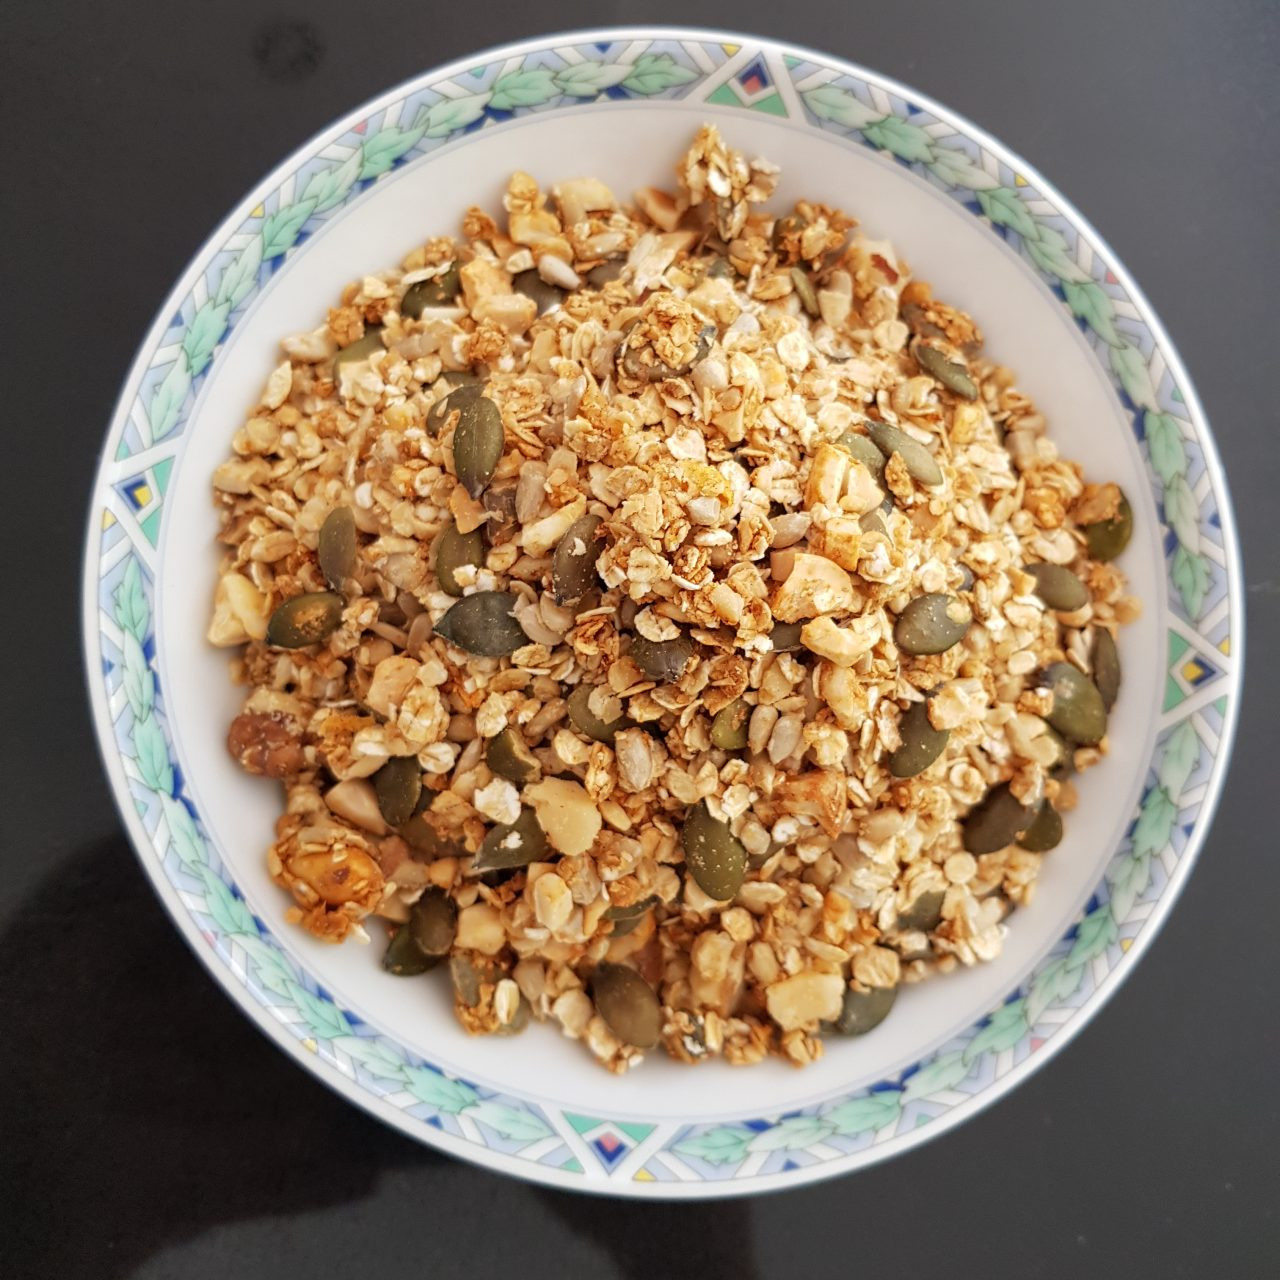 granola-1-1280x1280.jpg